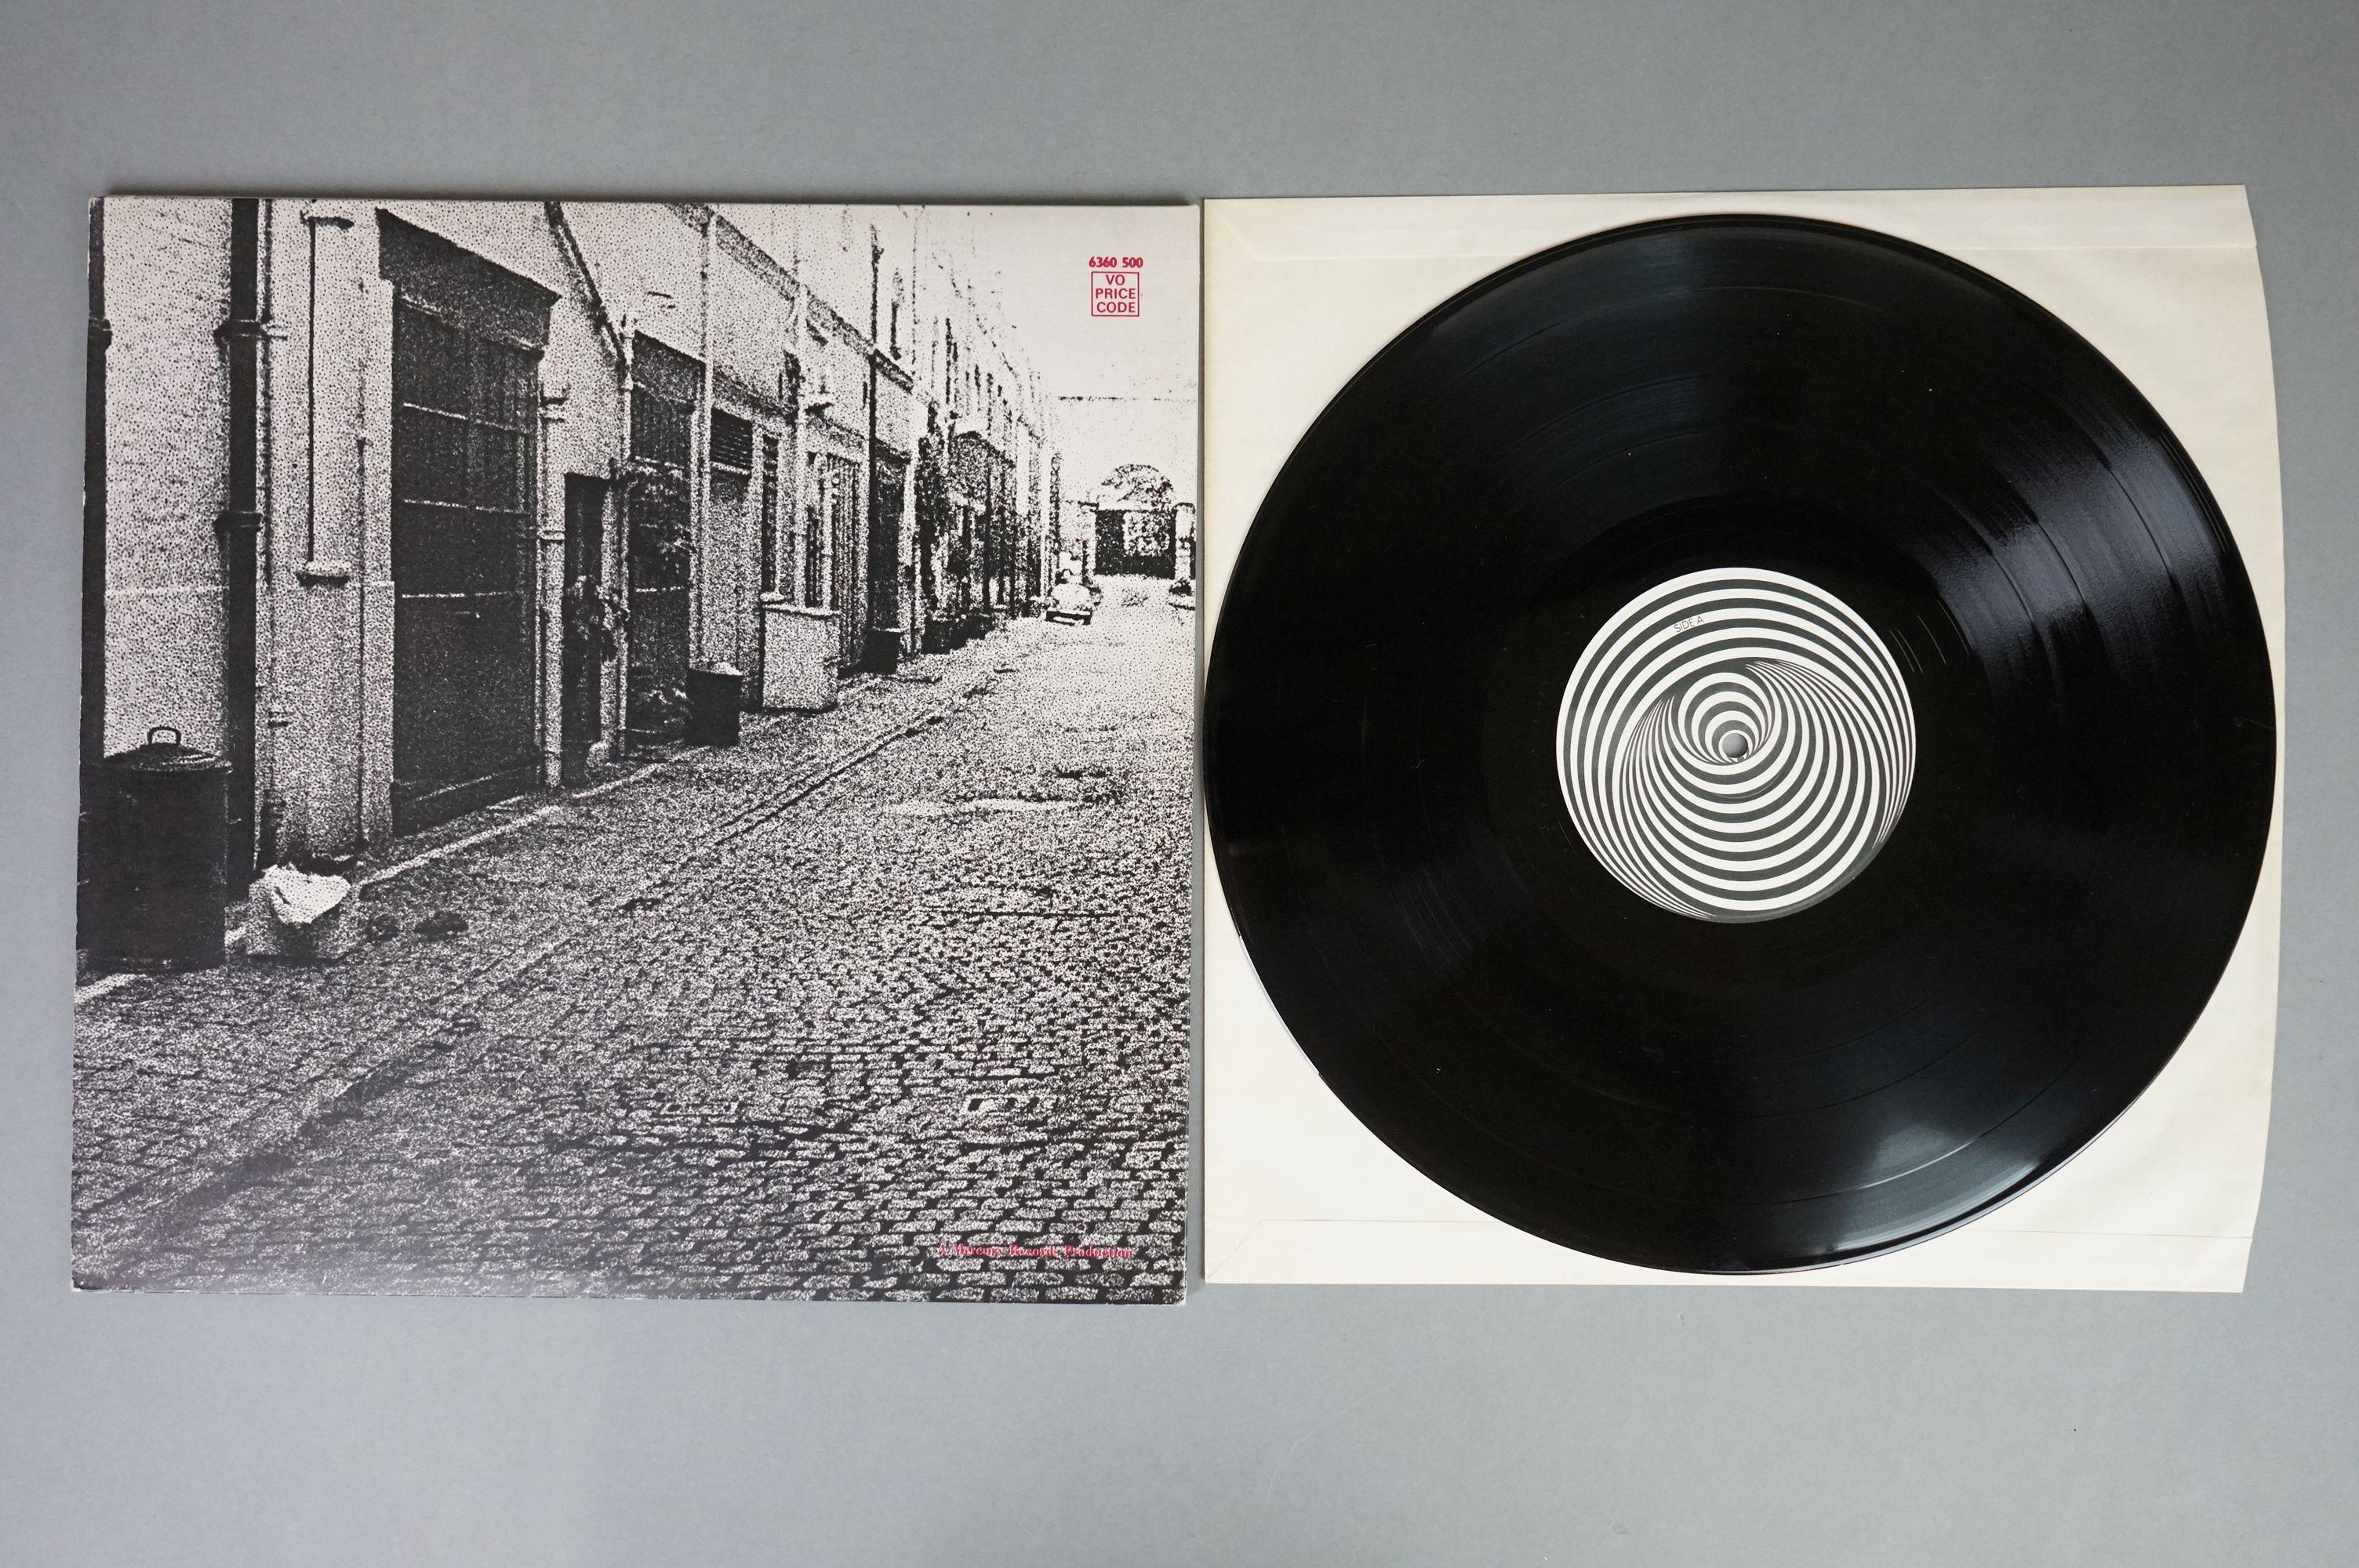 Vinyl - Rod Stewart 4 LP's to include An Old Raincoat Won't Ever Let You Down (Vertigo VO4) gatefold - Image 10 of 14